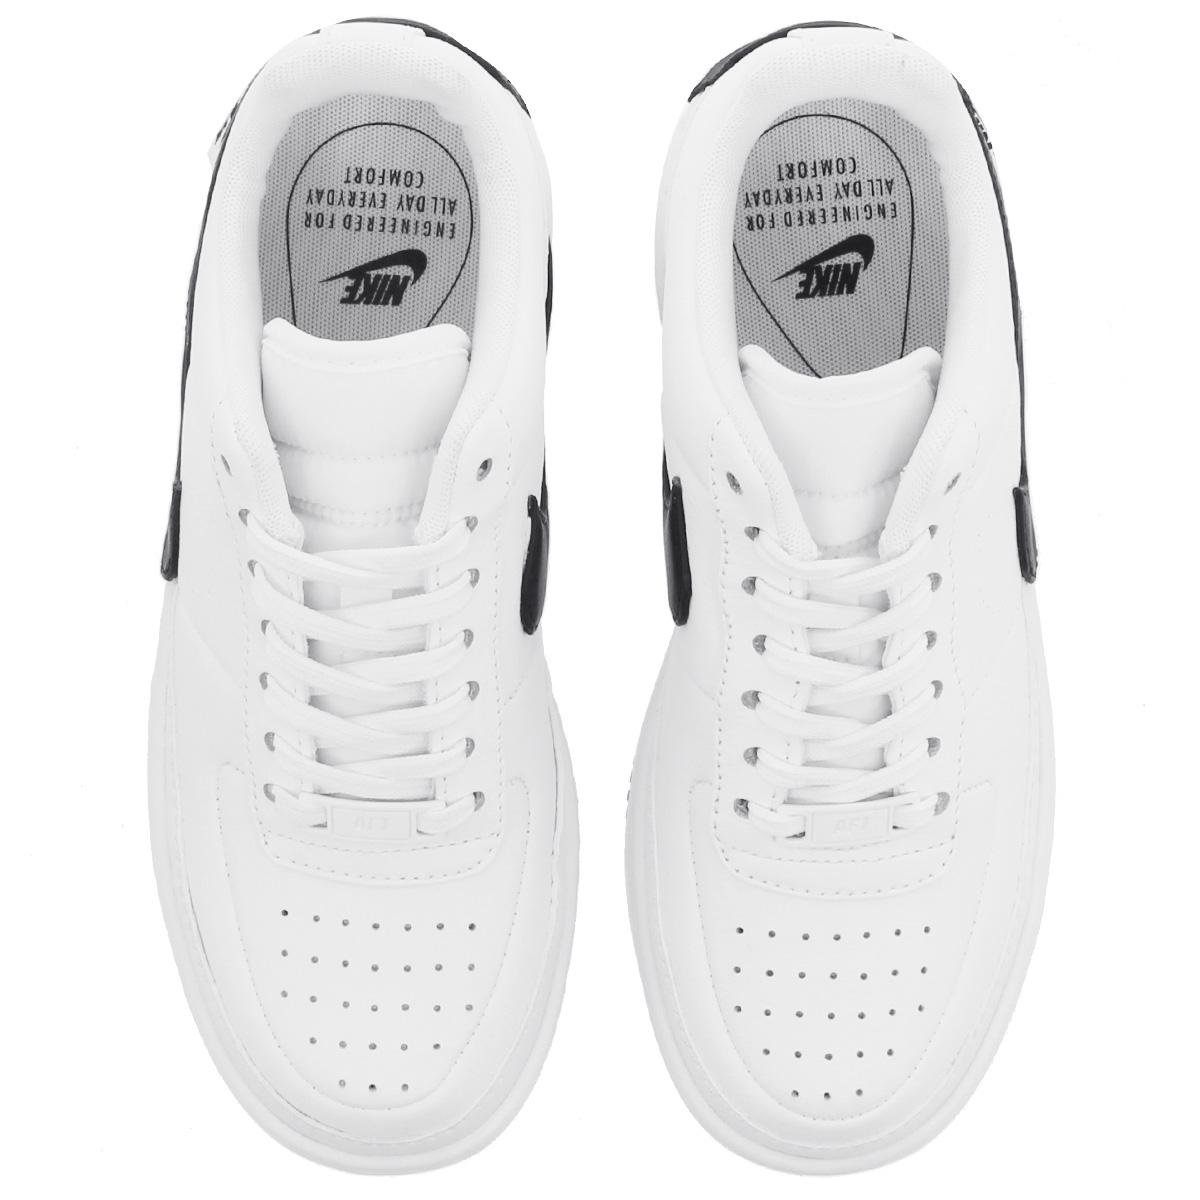 buy popular c6183 82f42 NIKE WMNS AIR FORCE 1 JESTER XX Nike women air force 1 Jester XX  WHITE/BLACK ao1220-102